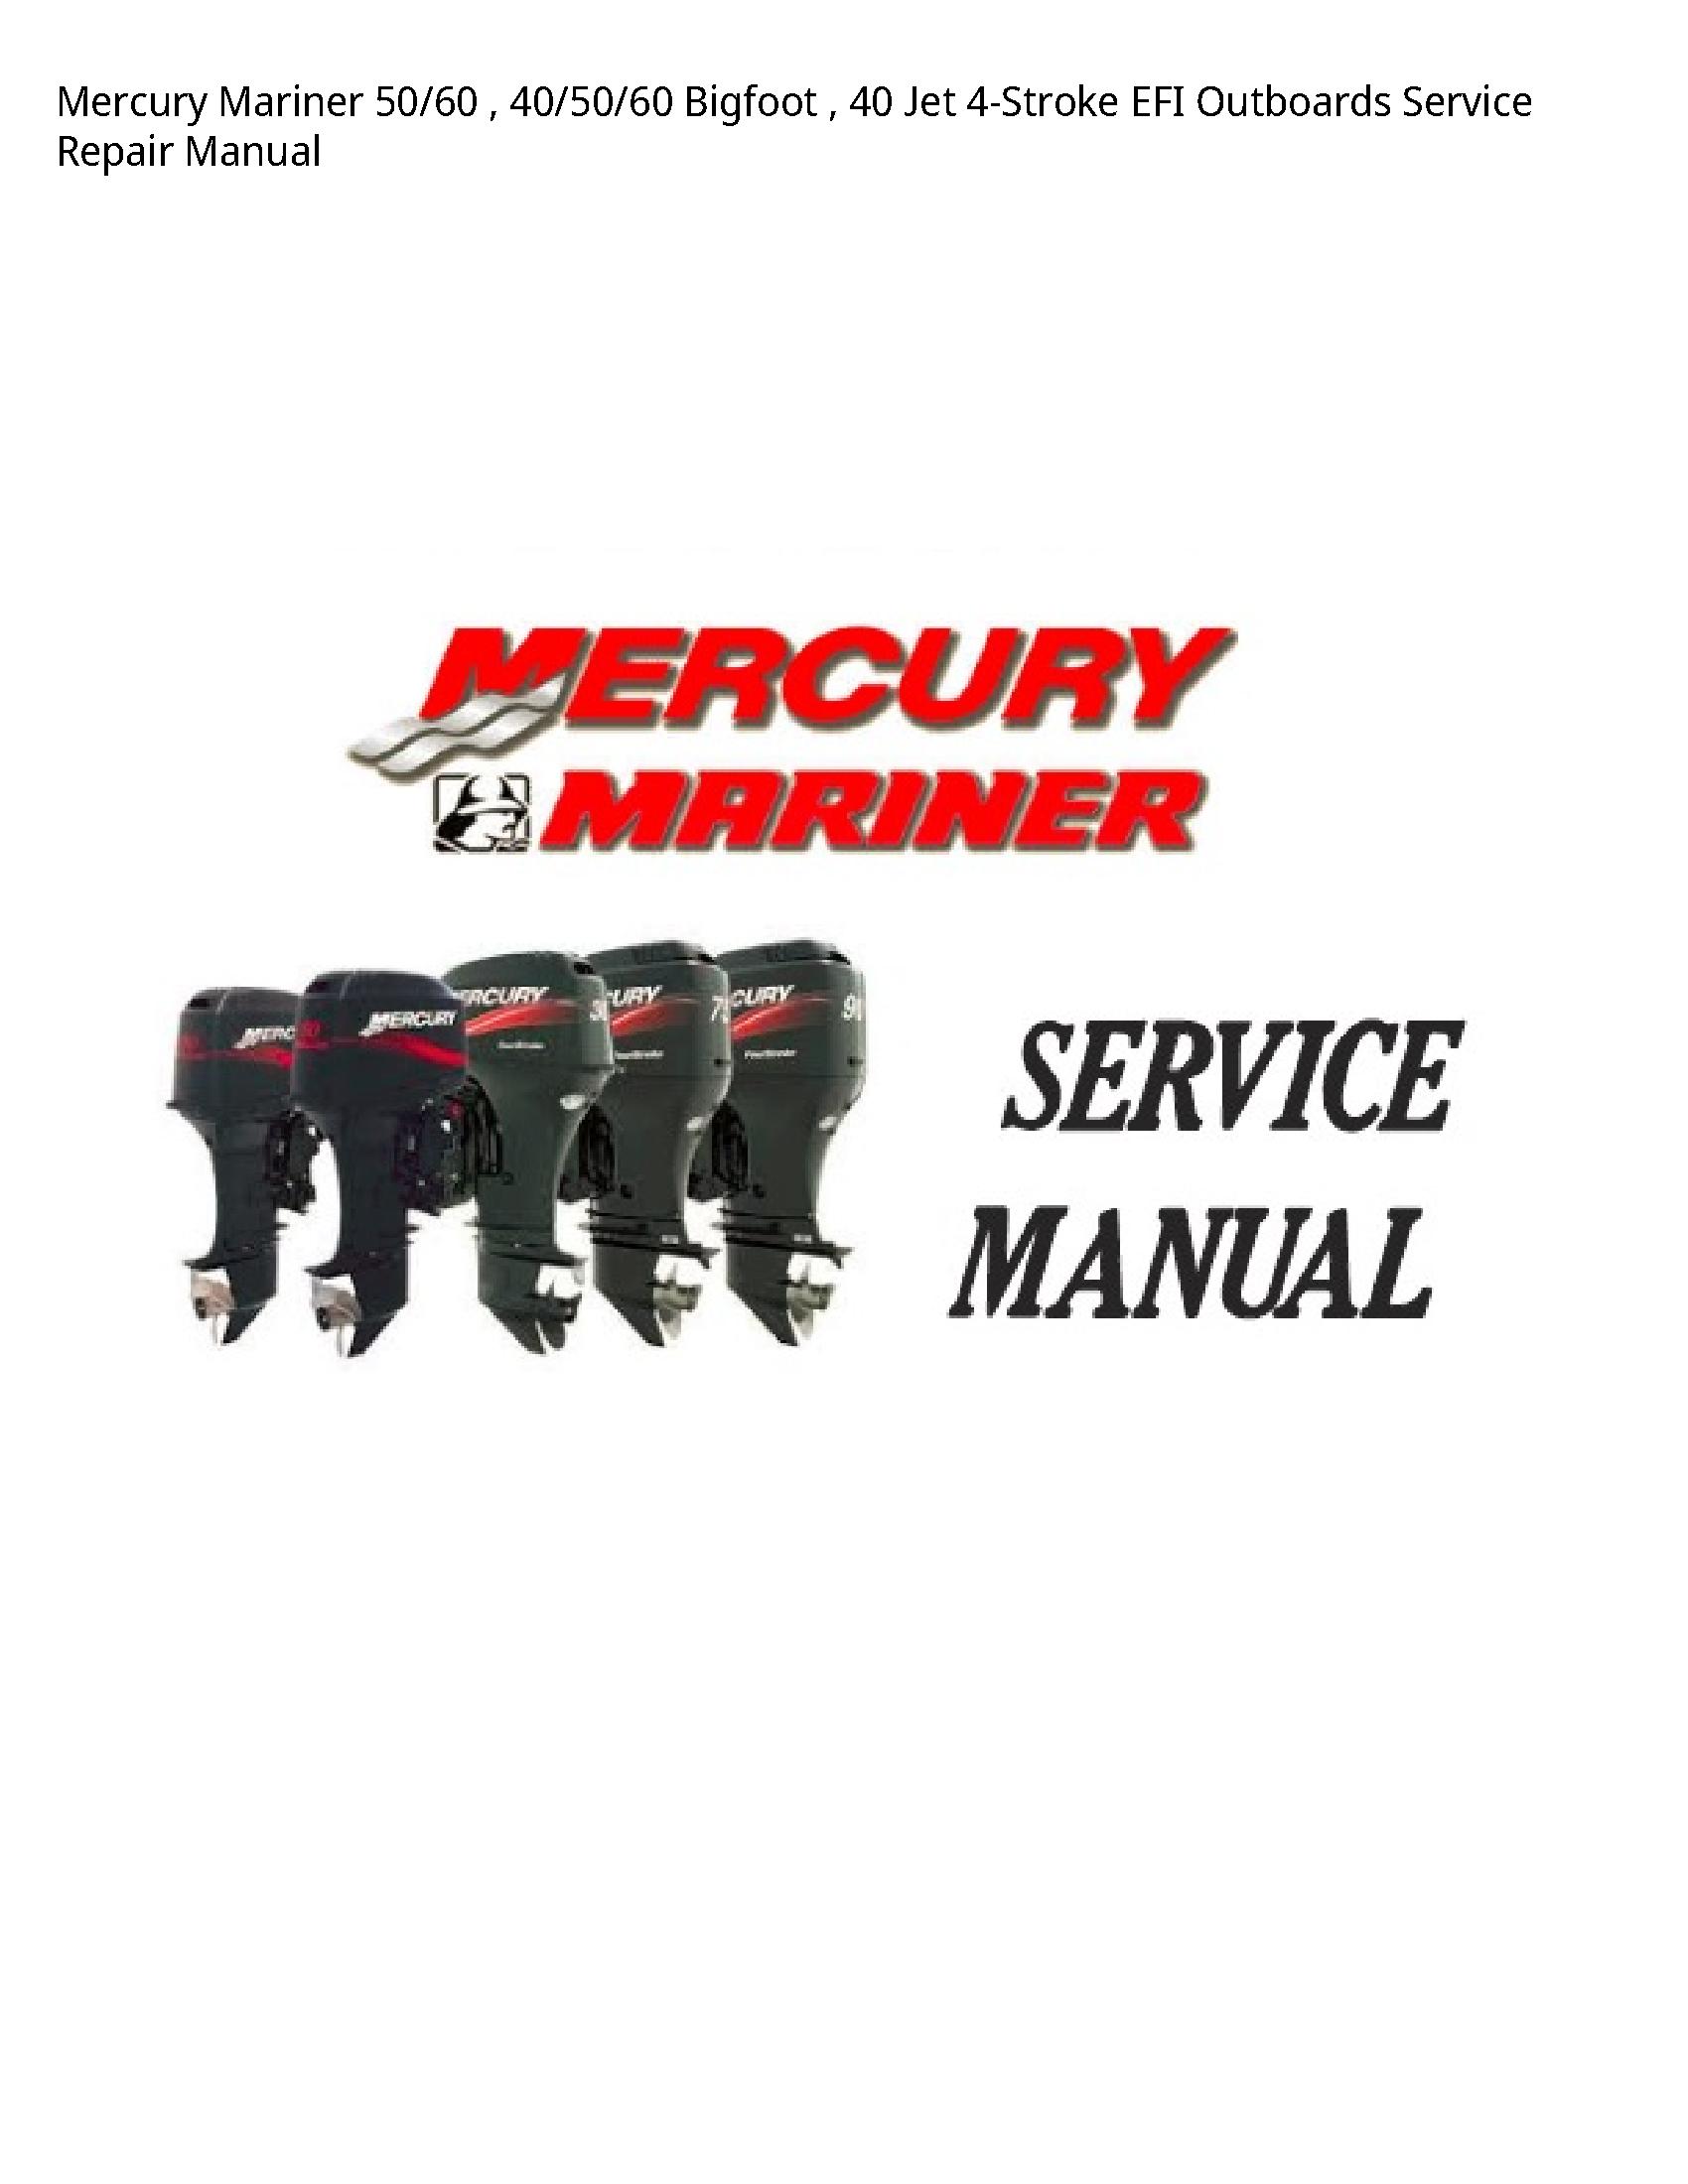 Mercury Mariner 50 Bigfoot Jet EFI Outboards manual